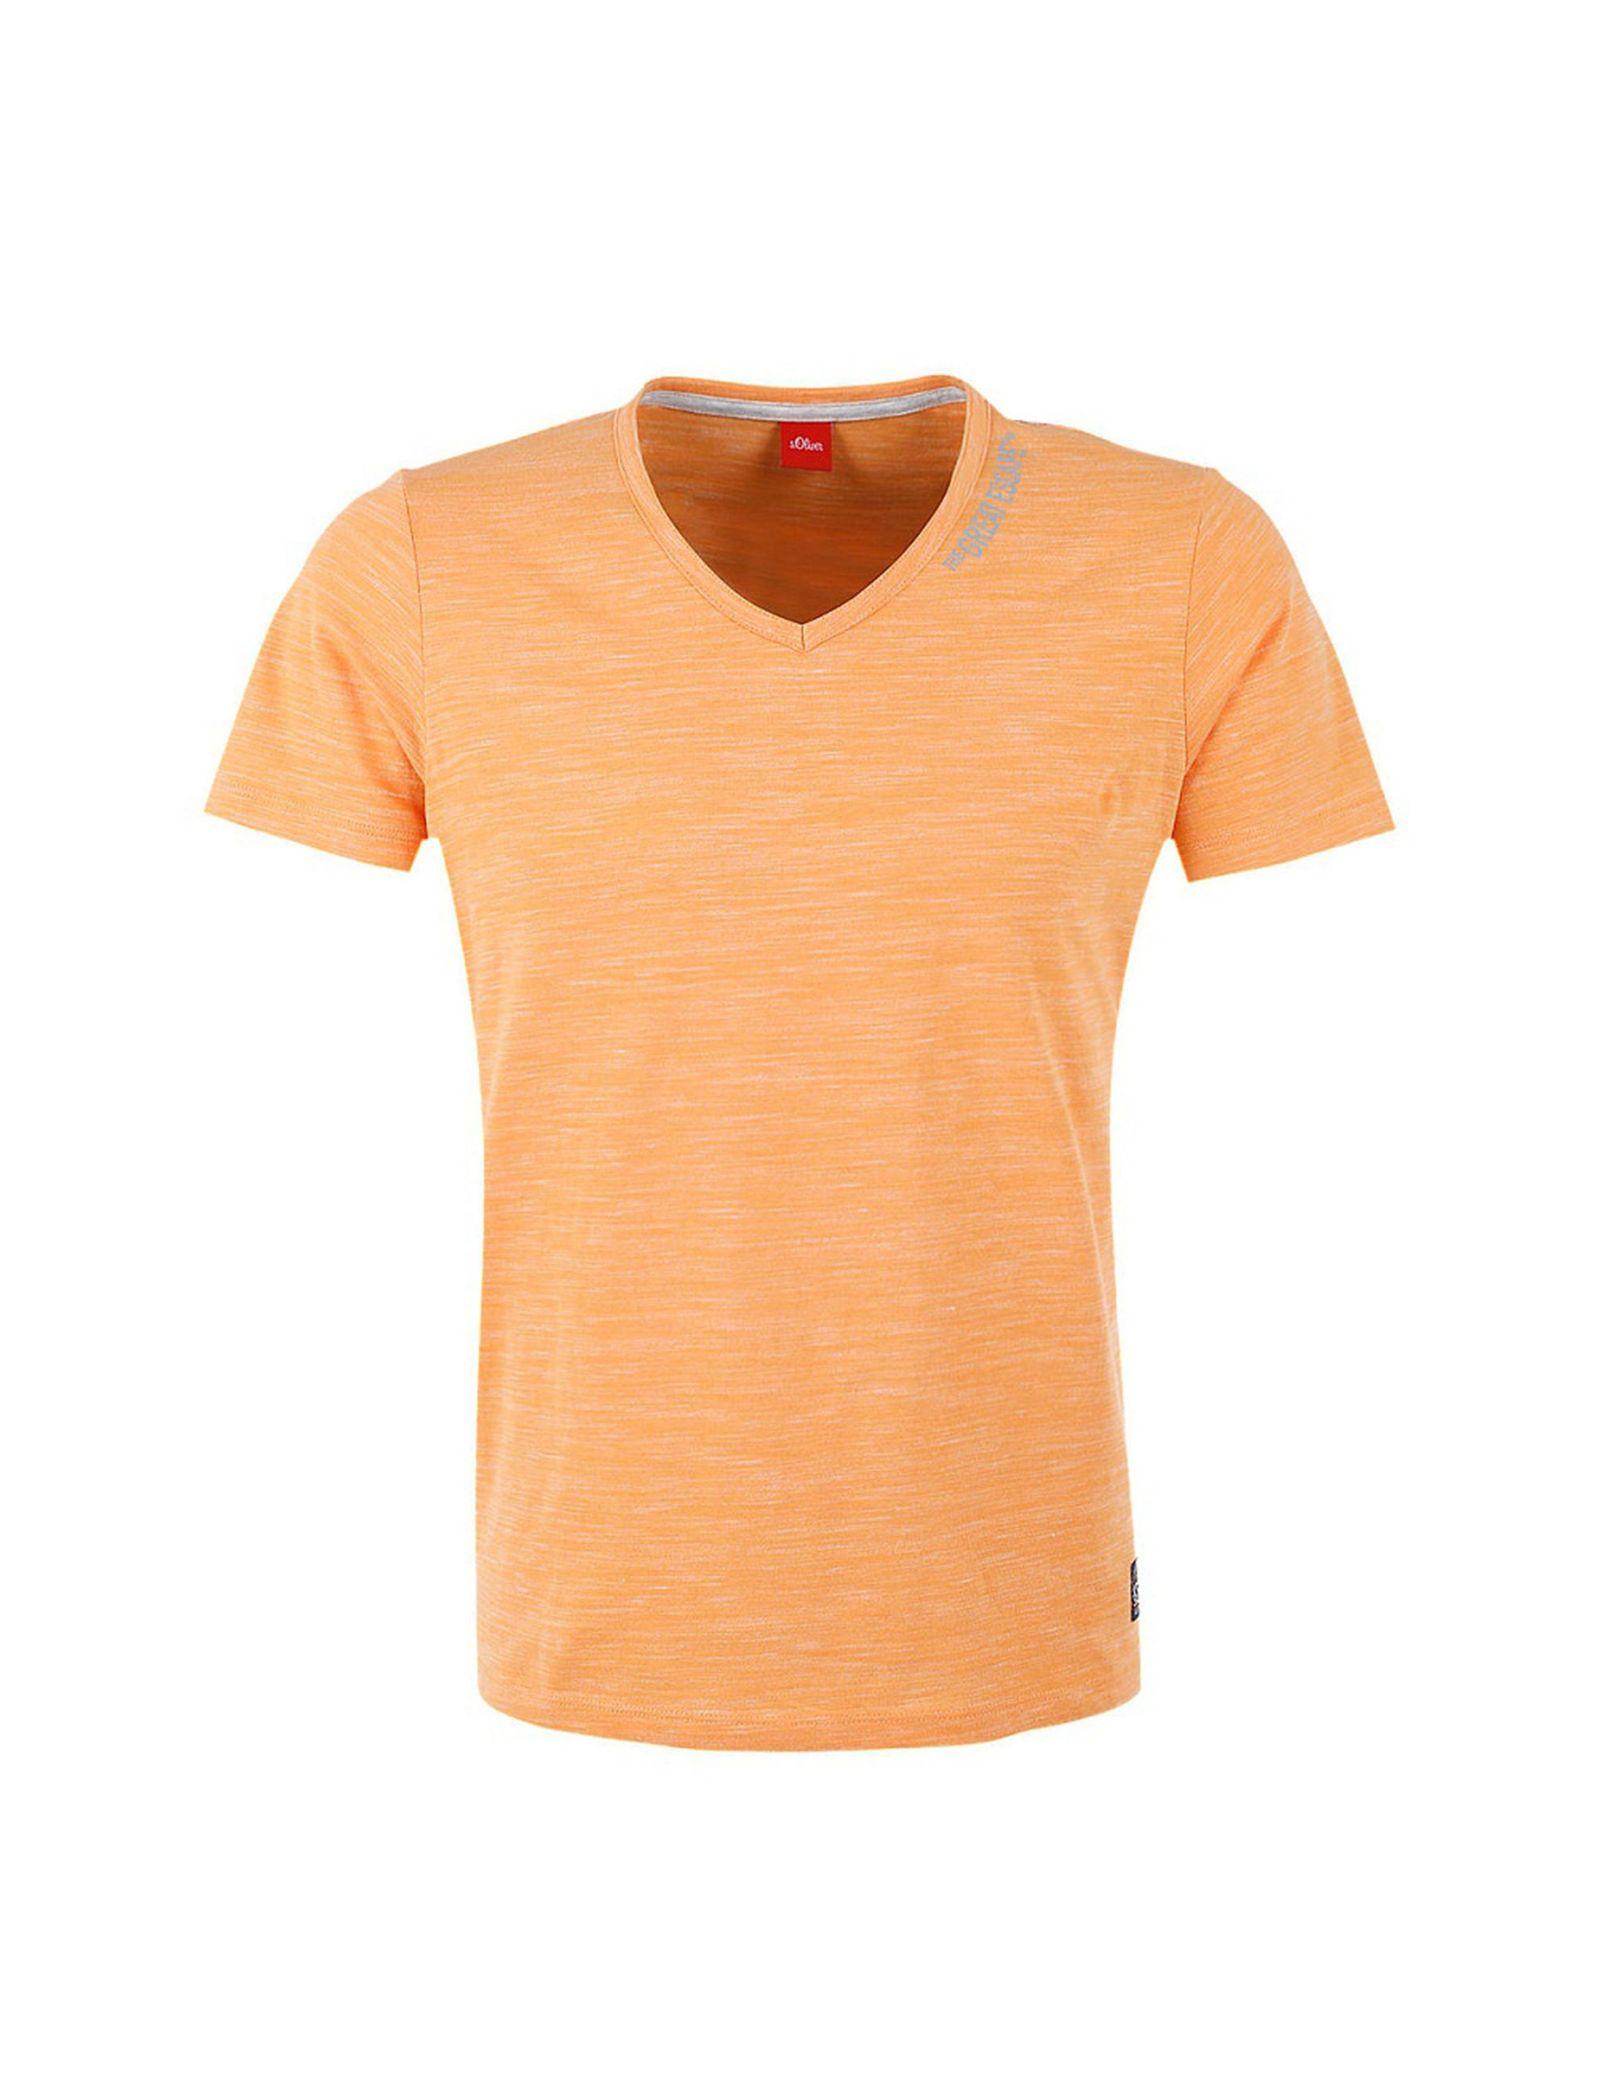 تی شرت نخی یقه هفت مردانه - اس.اولیور - نارنجي روشن - 3